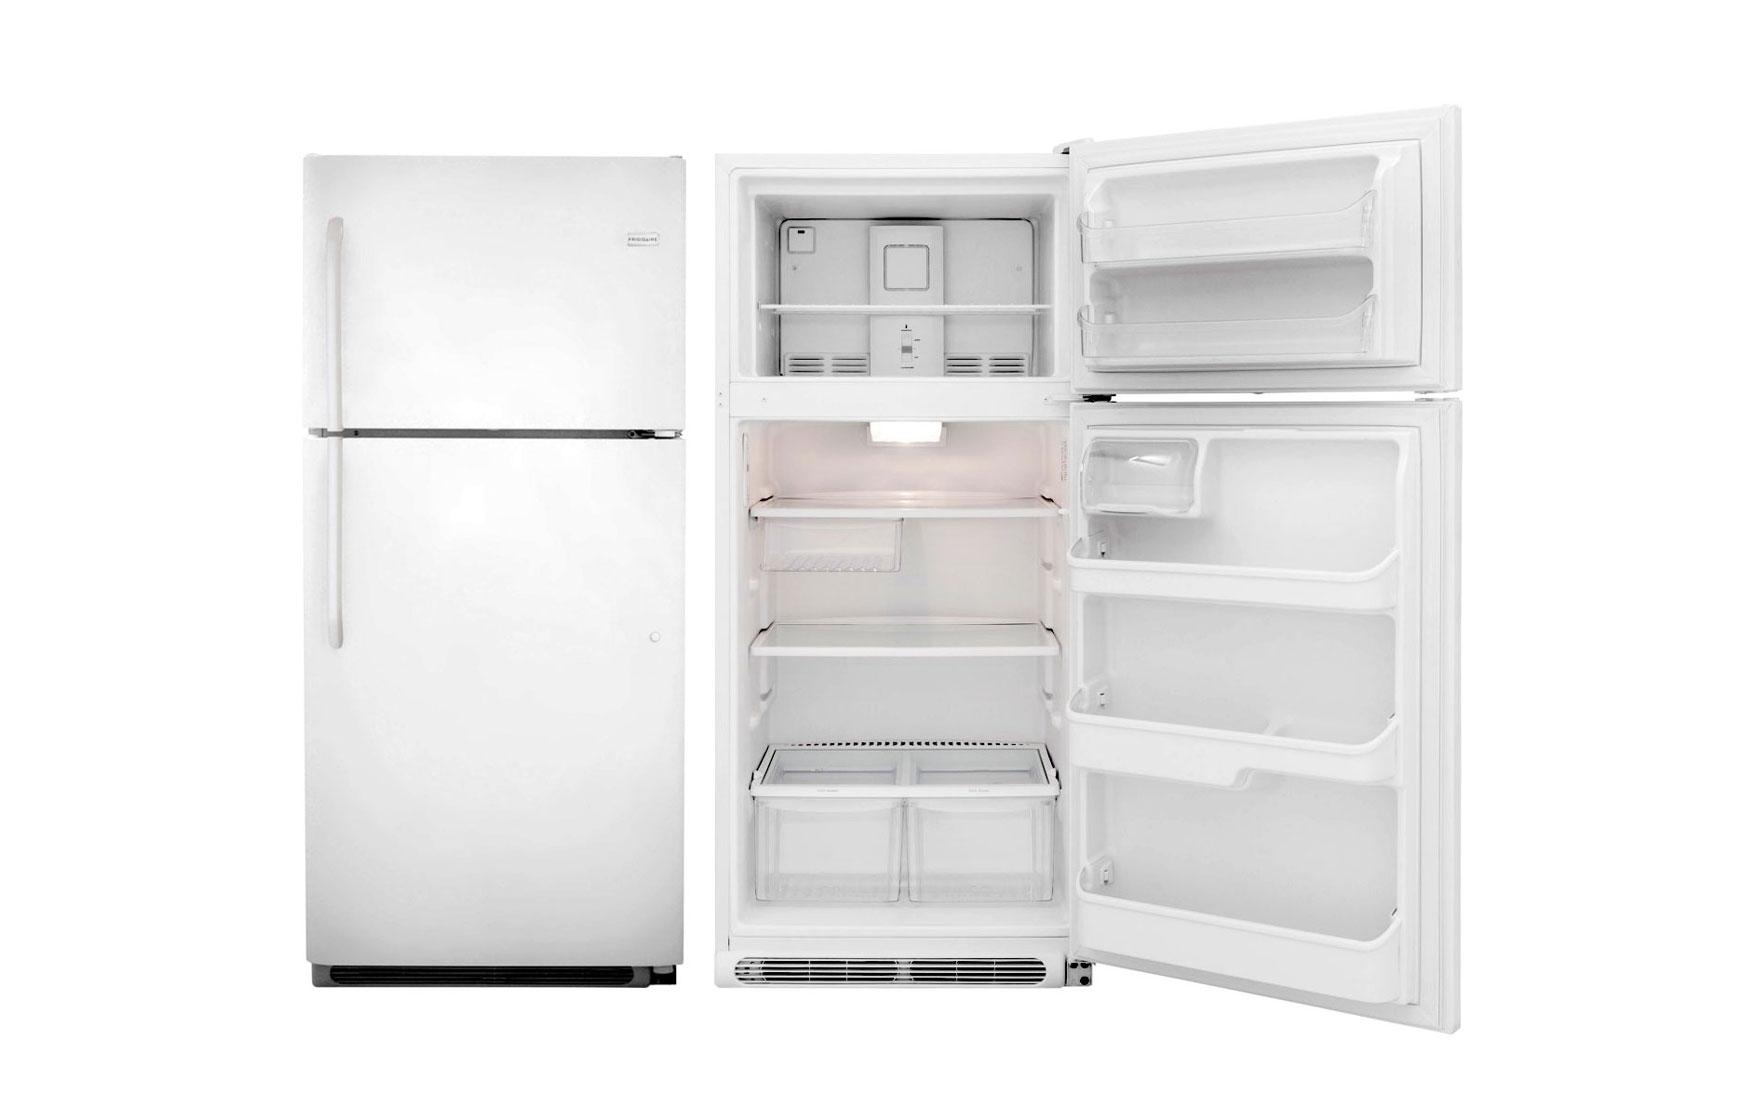 frigidaire 18cbf top freezer refrigerator fftr1814qw lp gas supplies. Black Bedroom Furniture Sets. Home Design Ideas